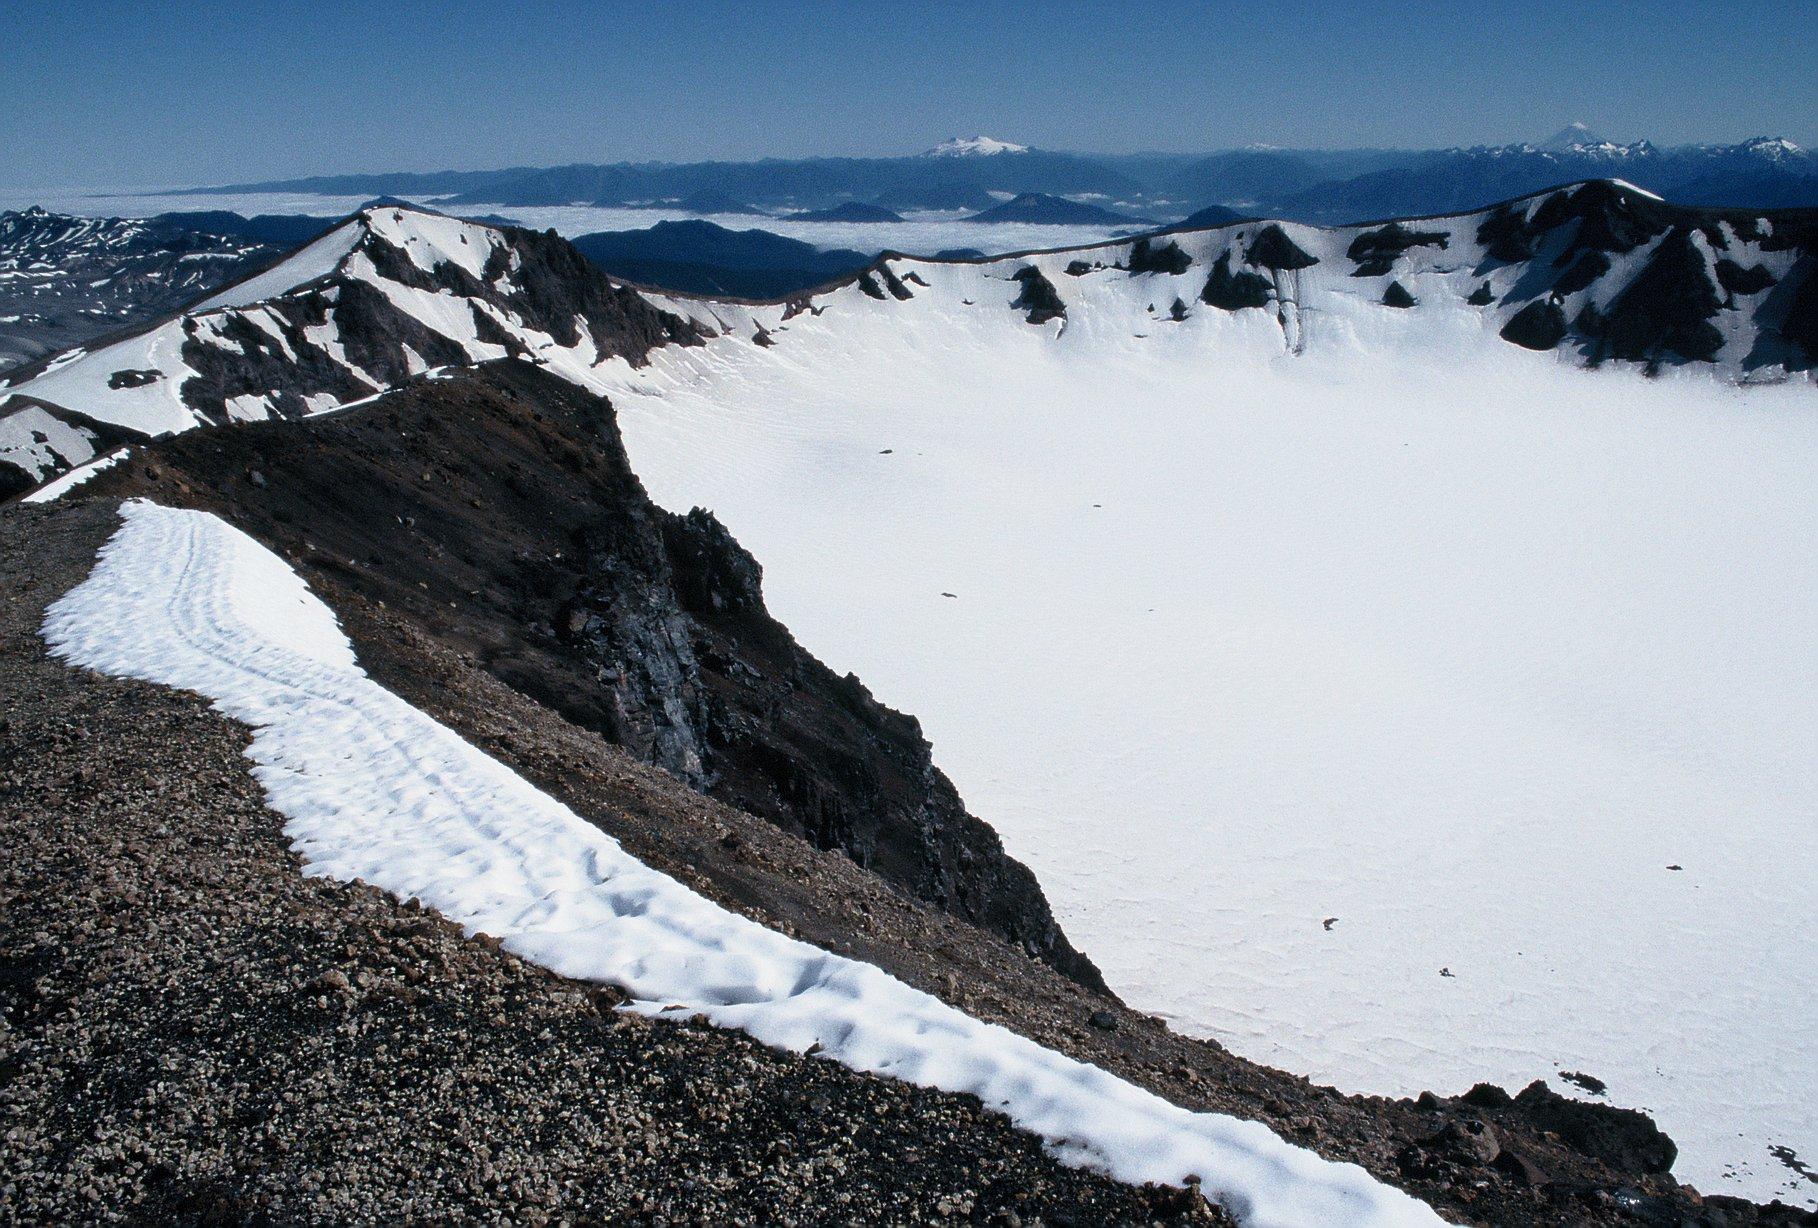 File:Caldera-of-puyehue-volcano.jpg - Wikipedia